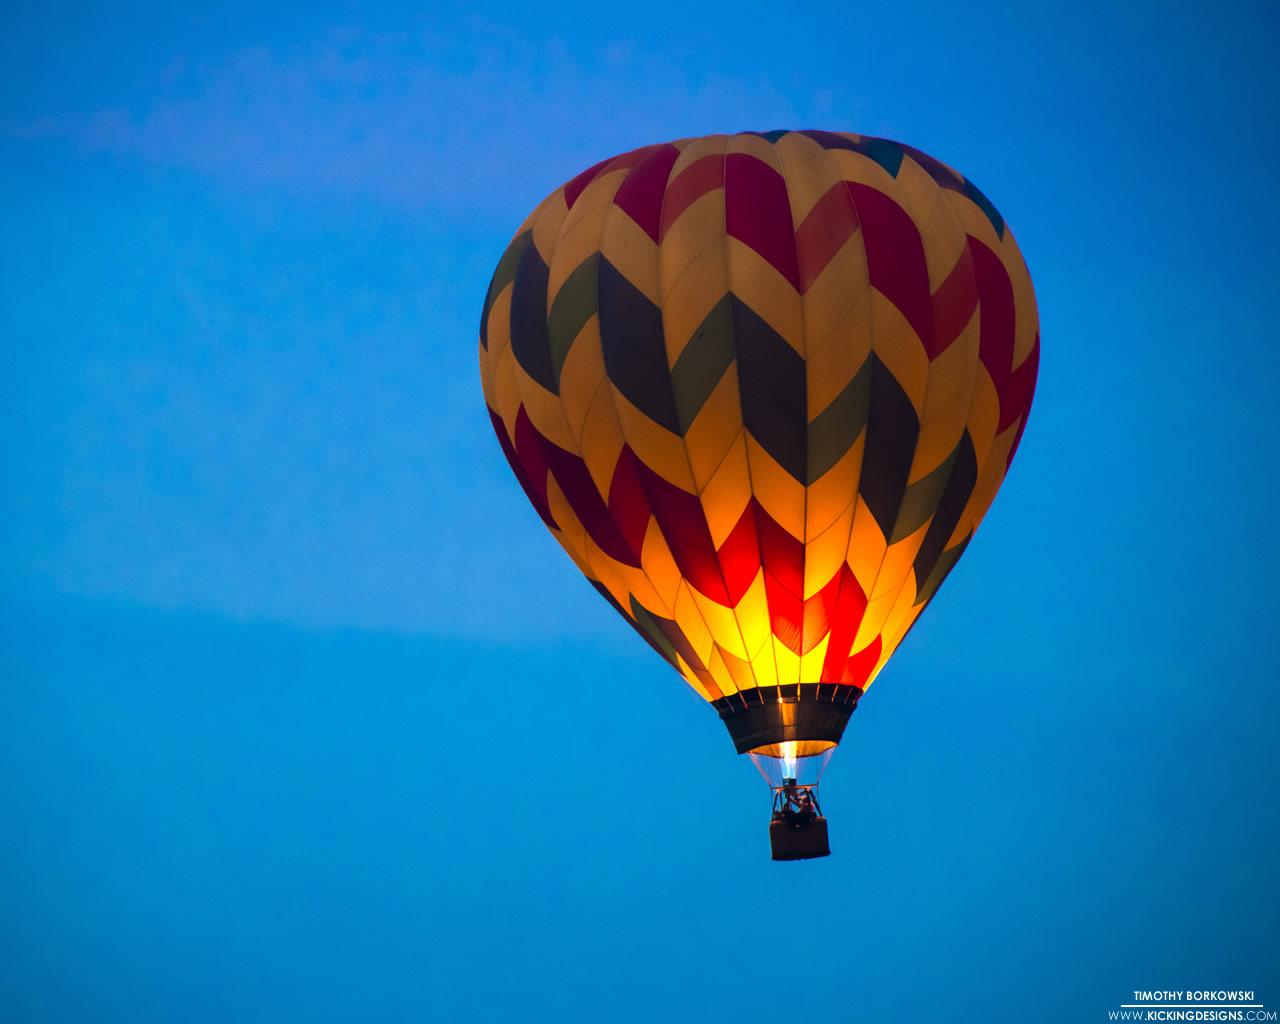 Hot Air Balloon 9 24 2012 Wallpaper Kicking Designs 1280x1024